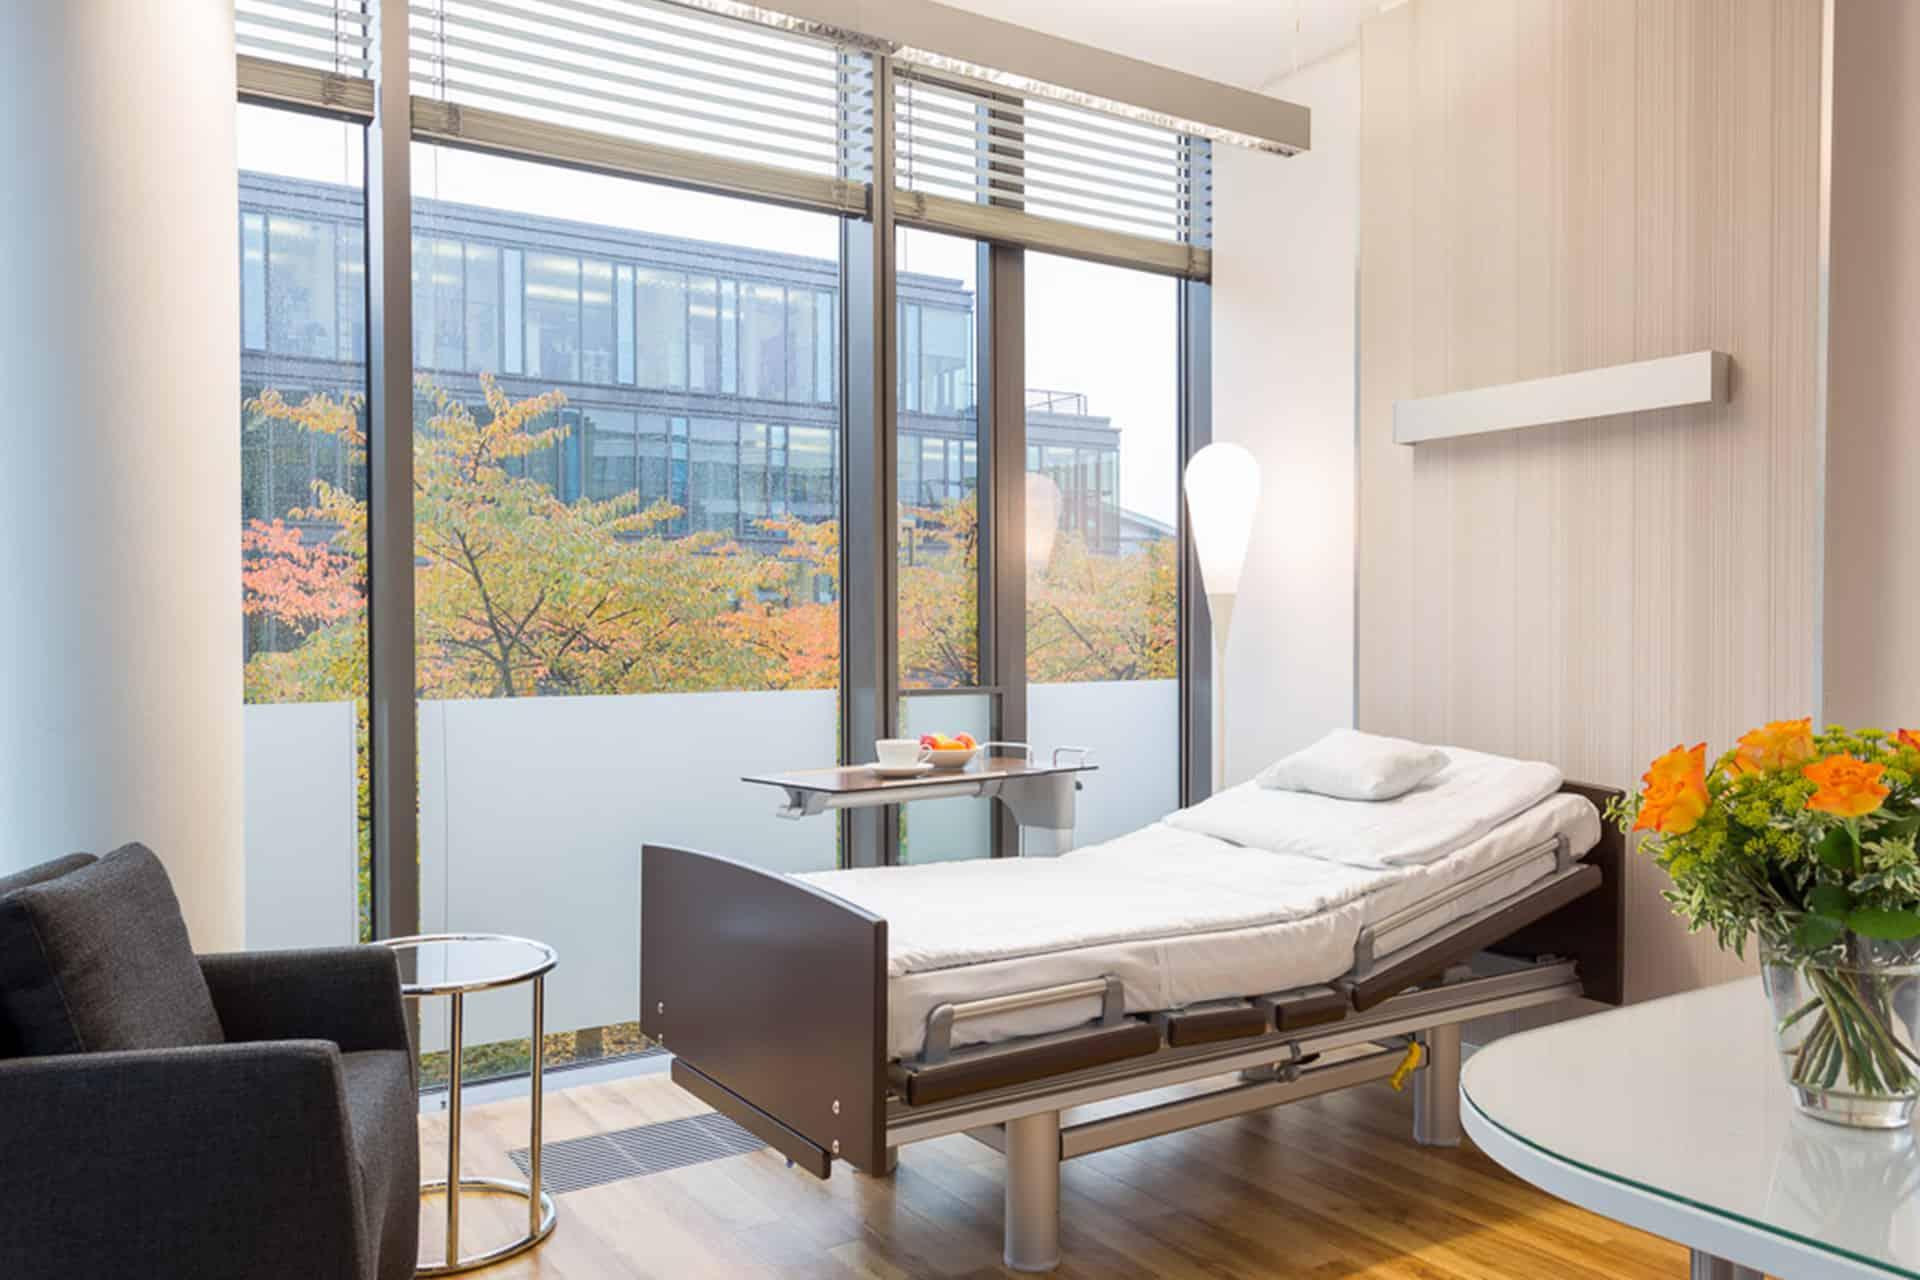 Your accommodation in the Beta Klinik | Privatklinik | Beta Klinik